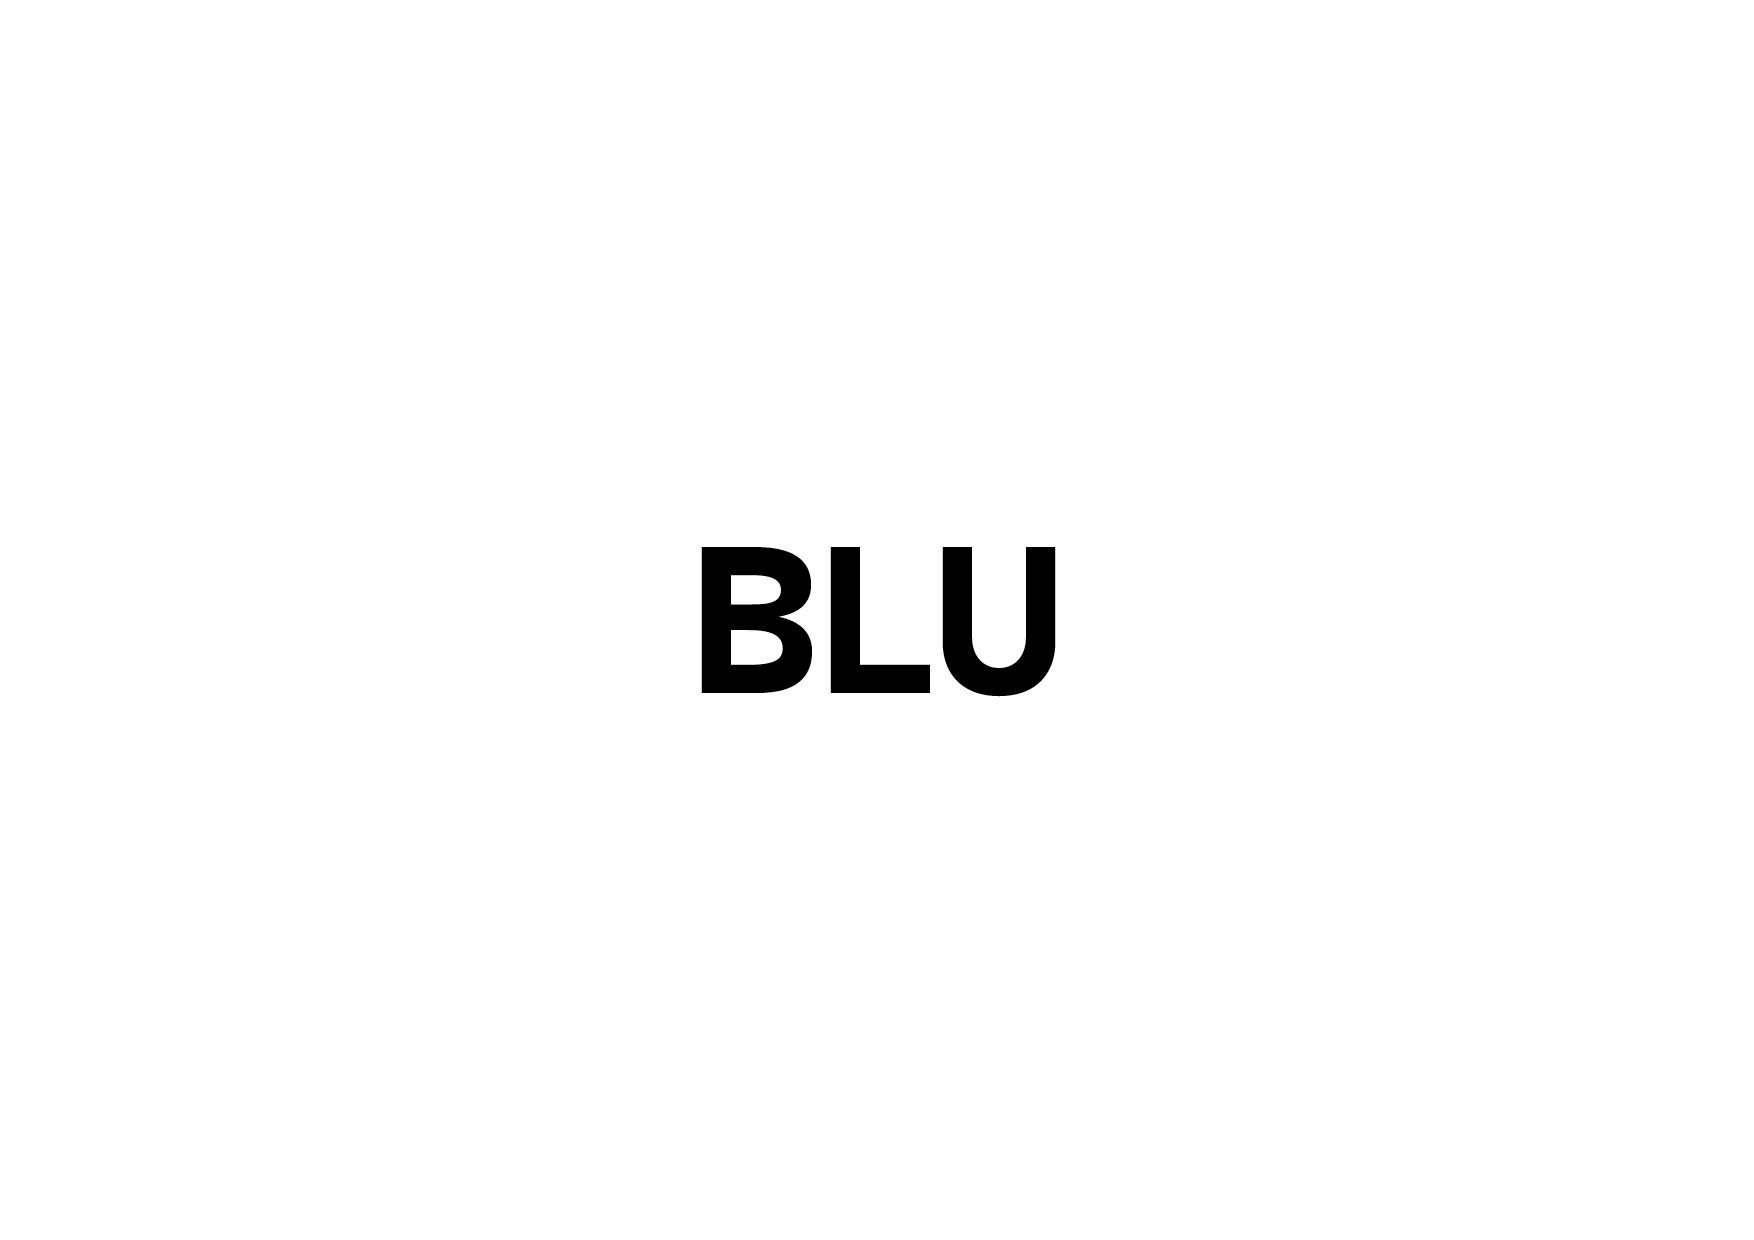 BLU Cologne |Riposte | Schrift | Design |Logo